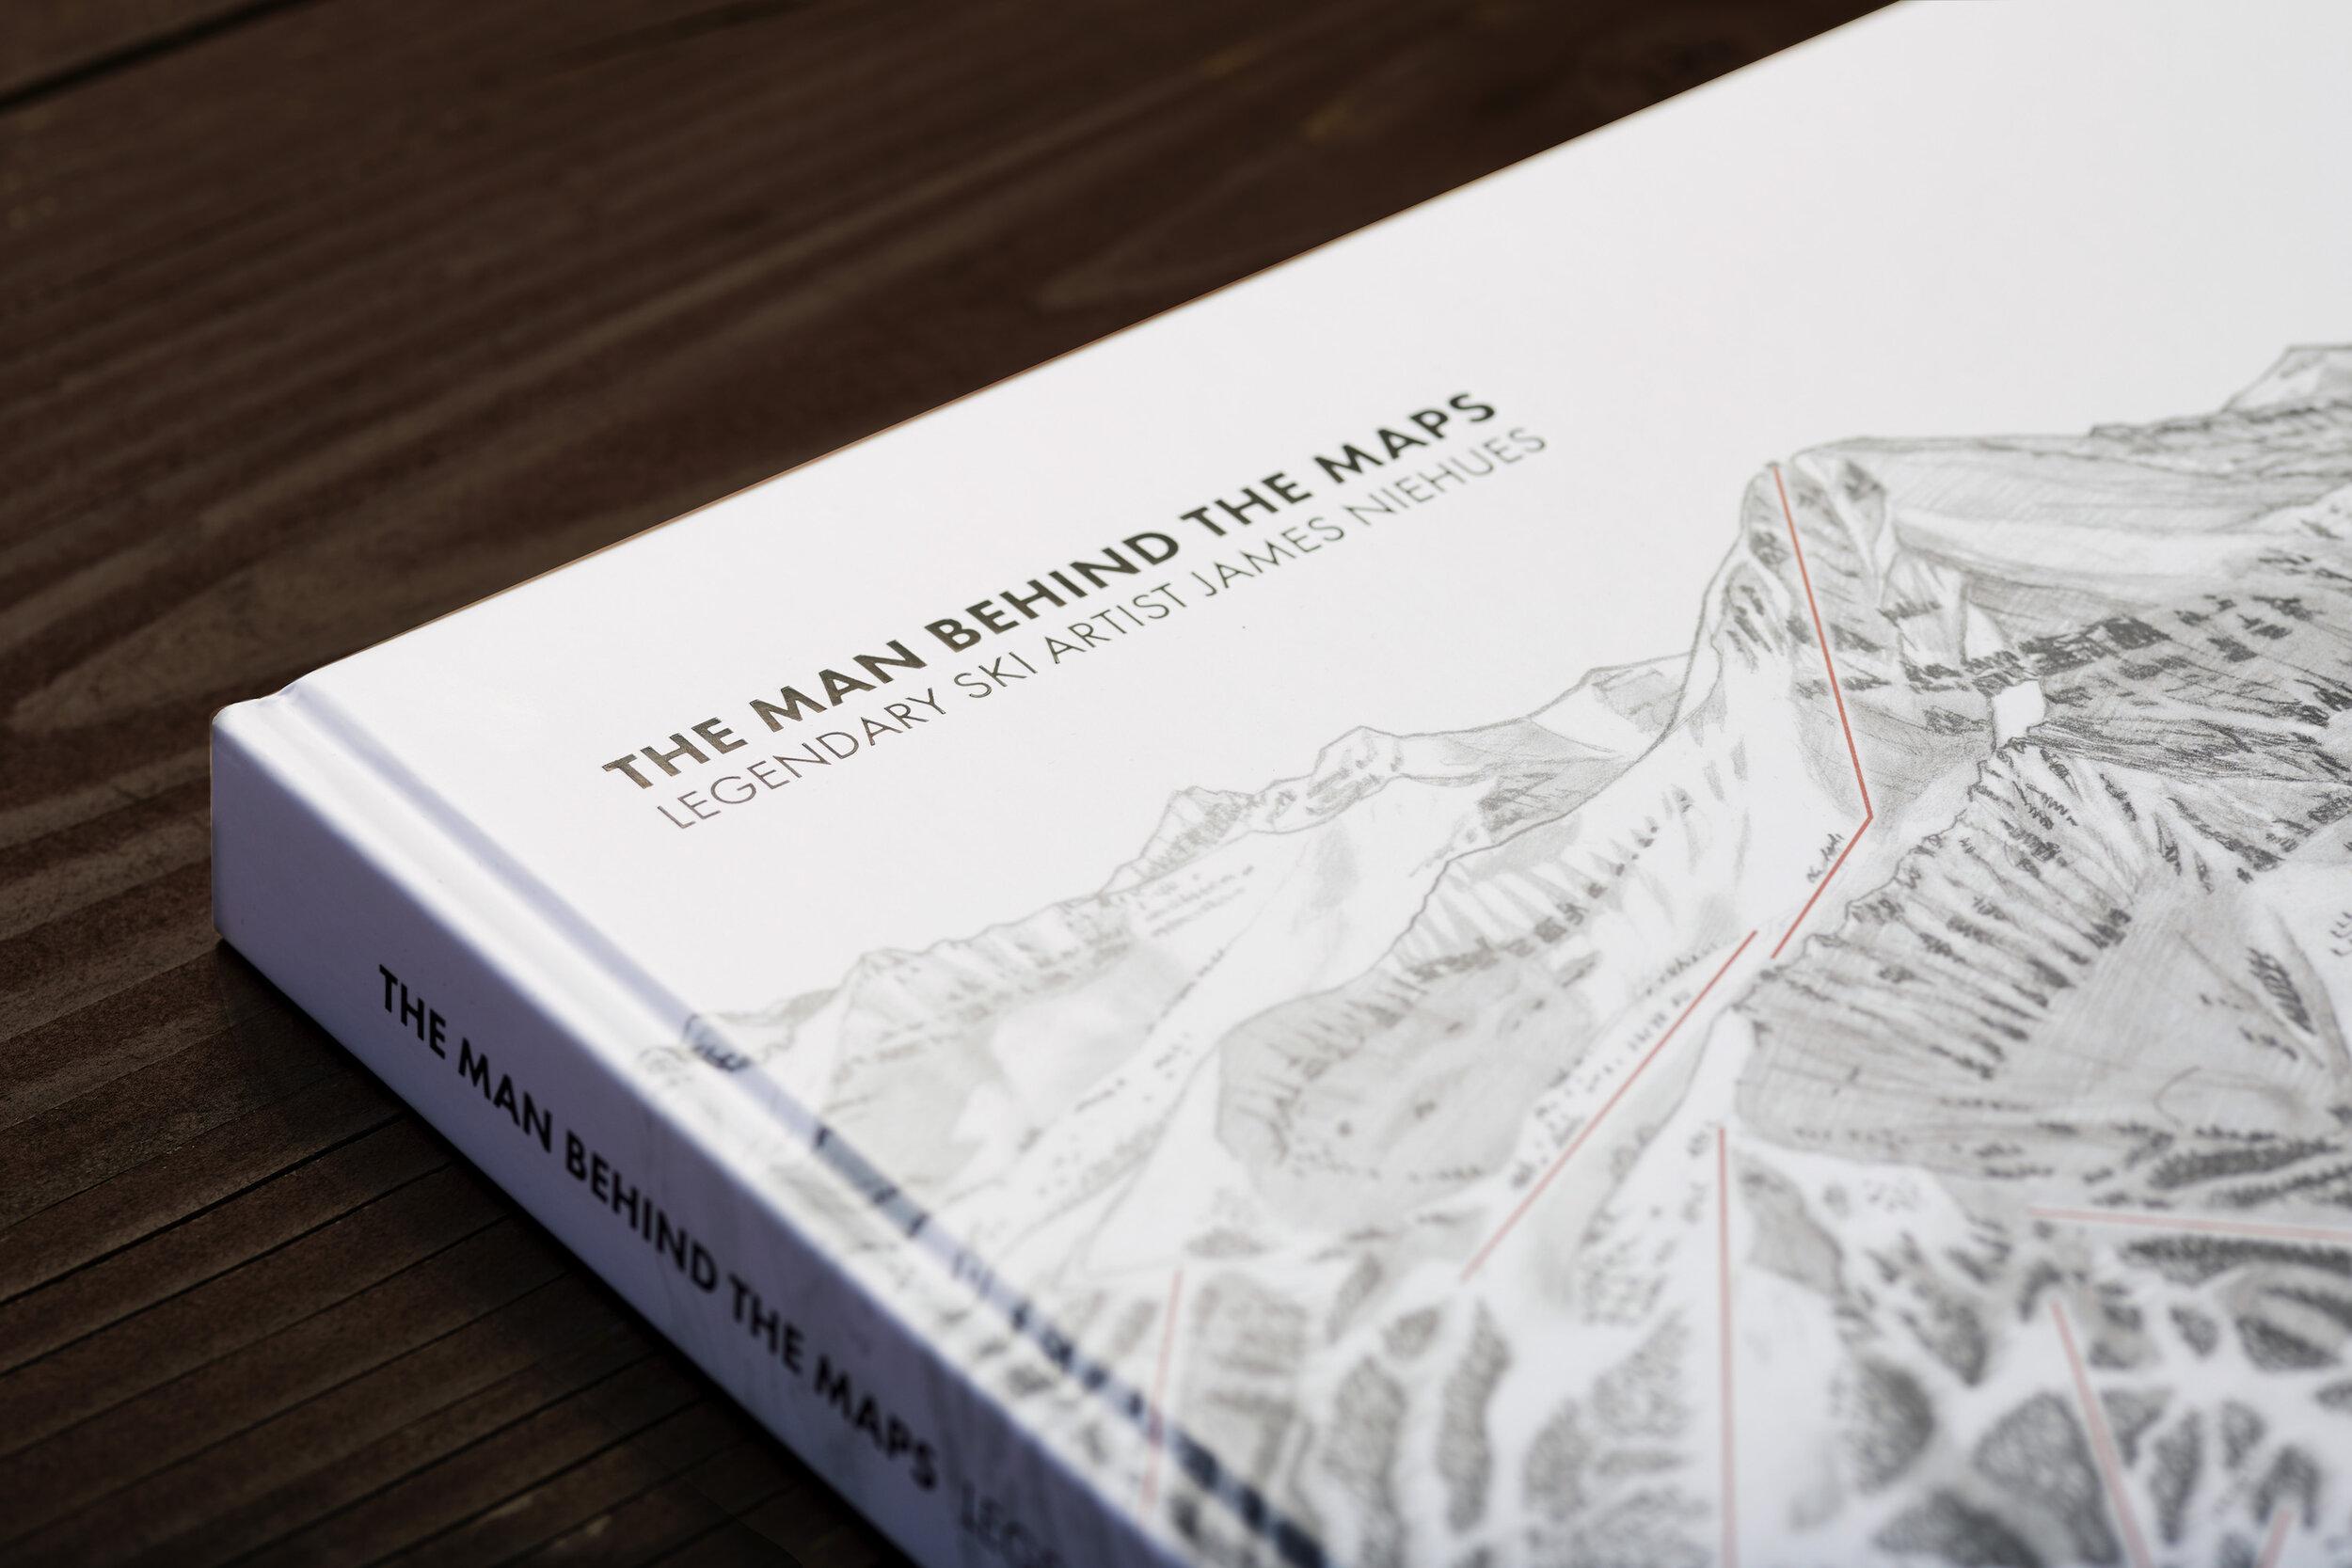 James Niehues The Man Behind The Ski Maps Exterior details_014 (1).jpg